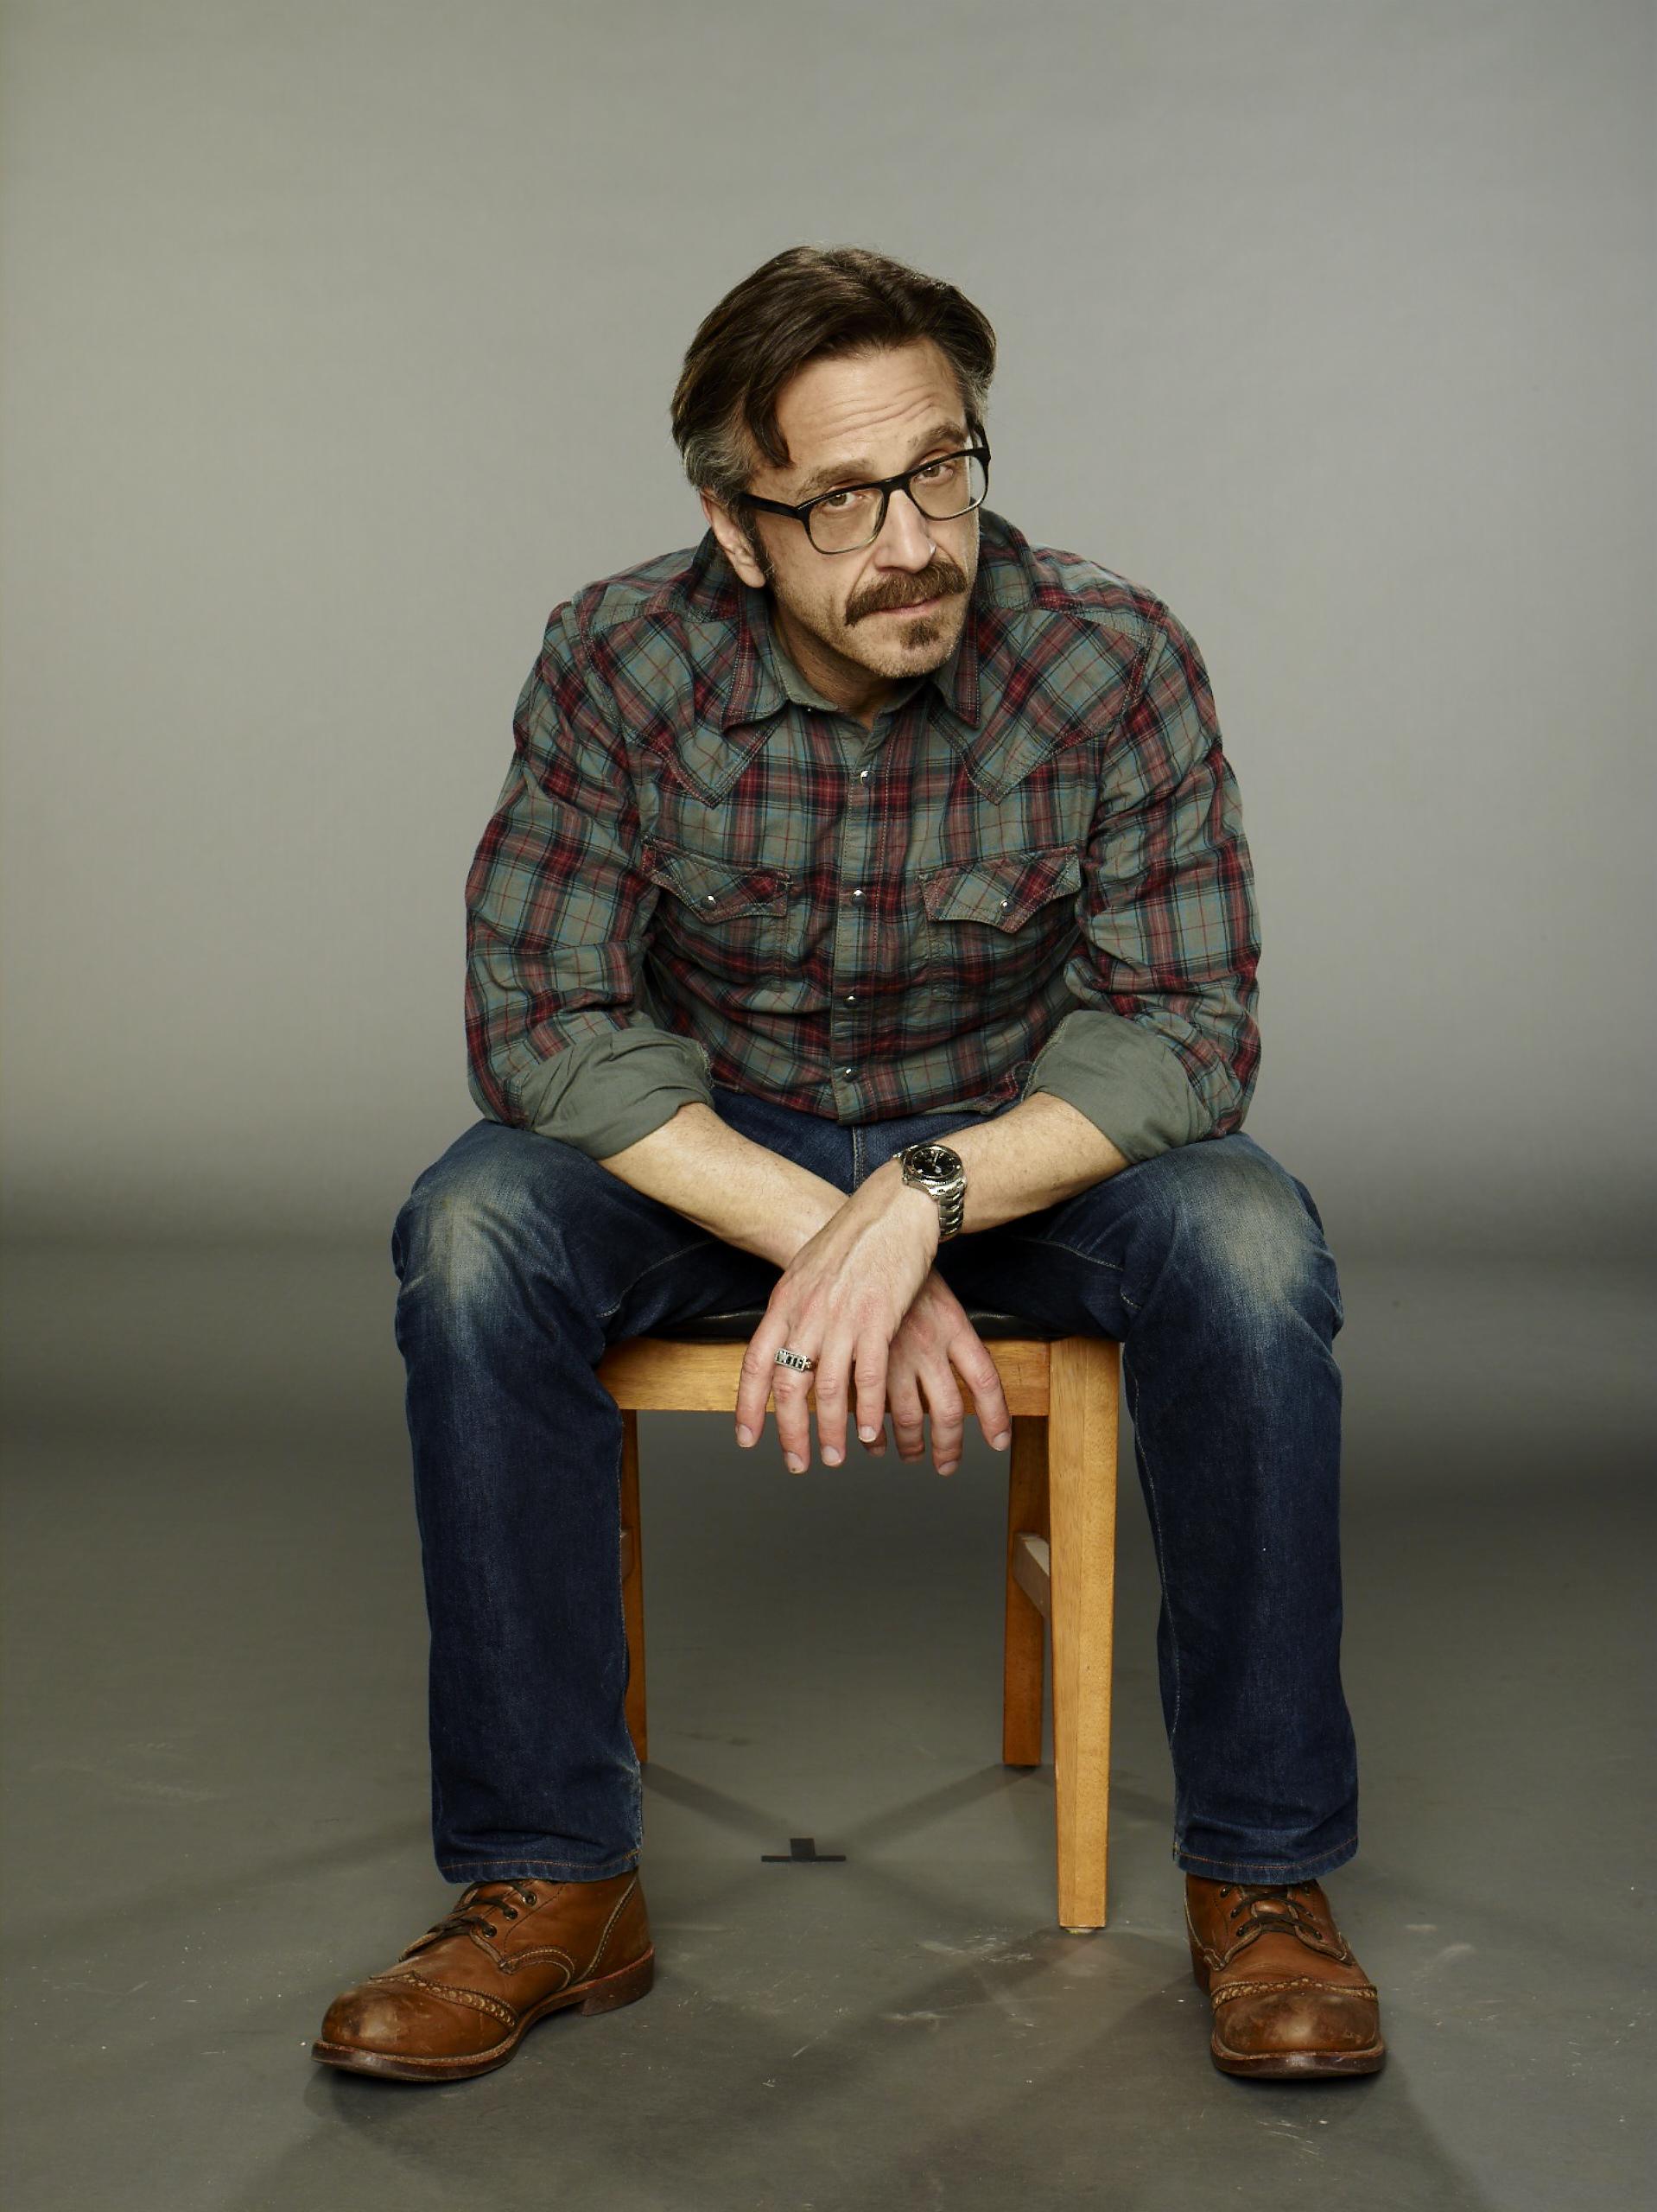 marc maron in designer jeans